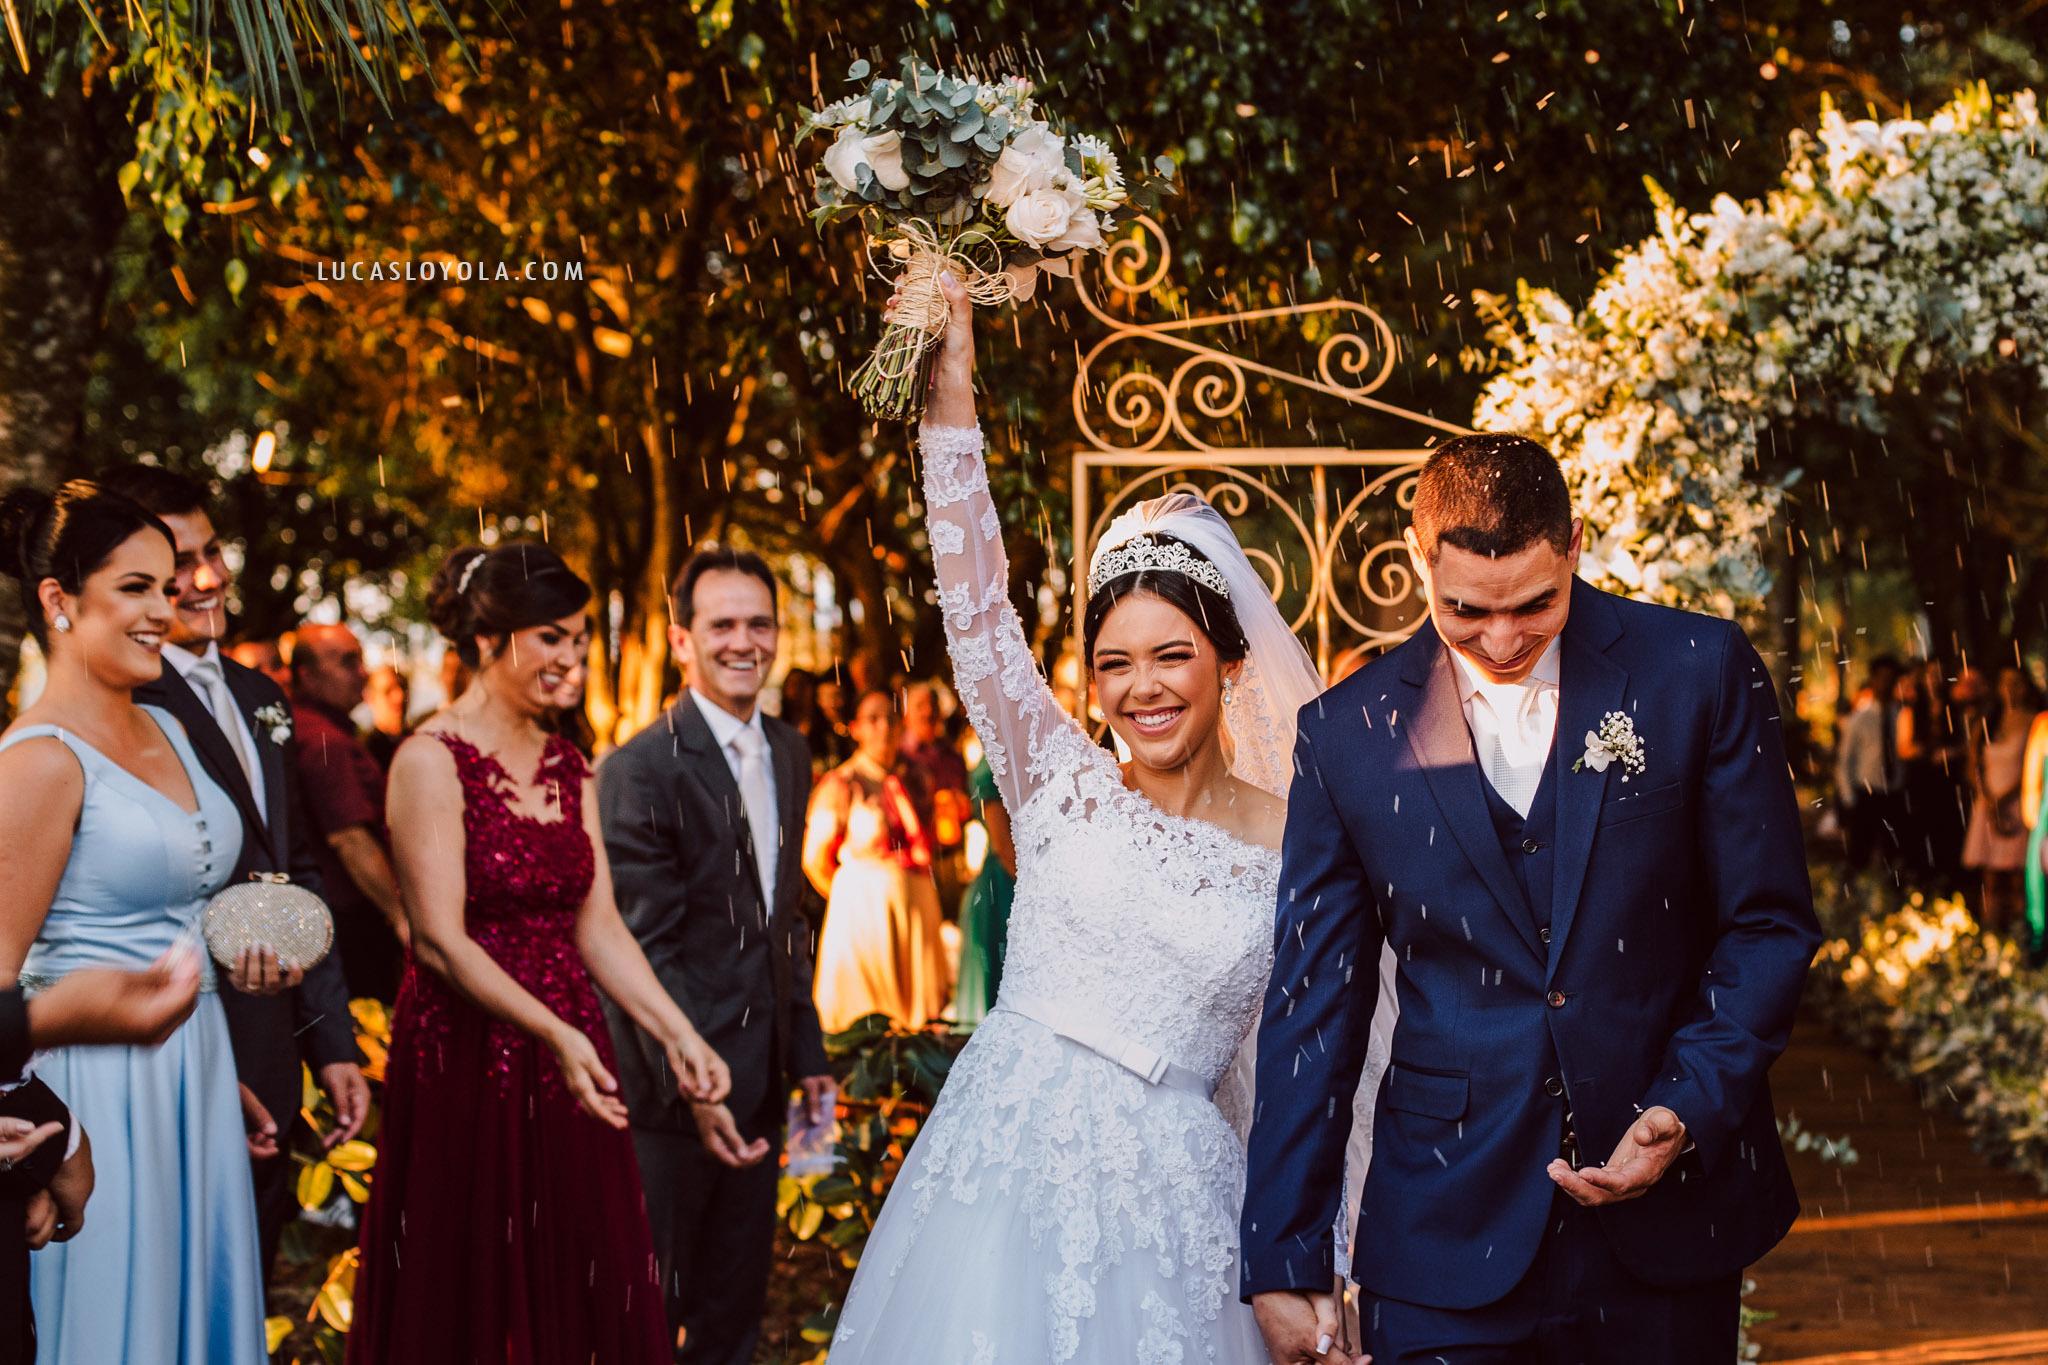 Contate Lucas Loyola Fotografia - Fotografo de casamentos Pouso Alegre.